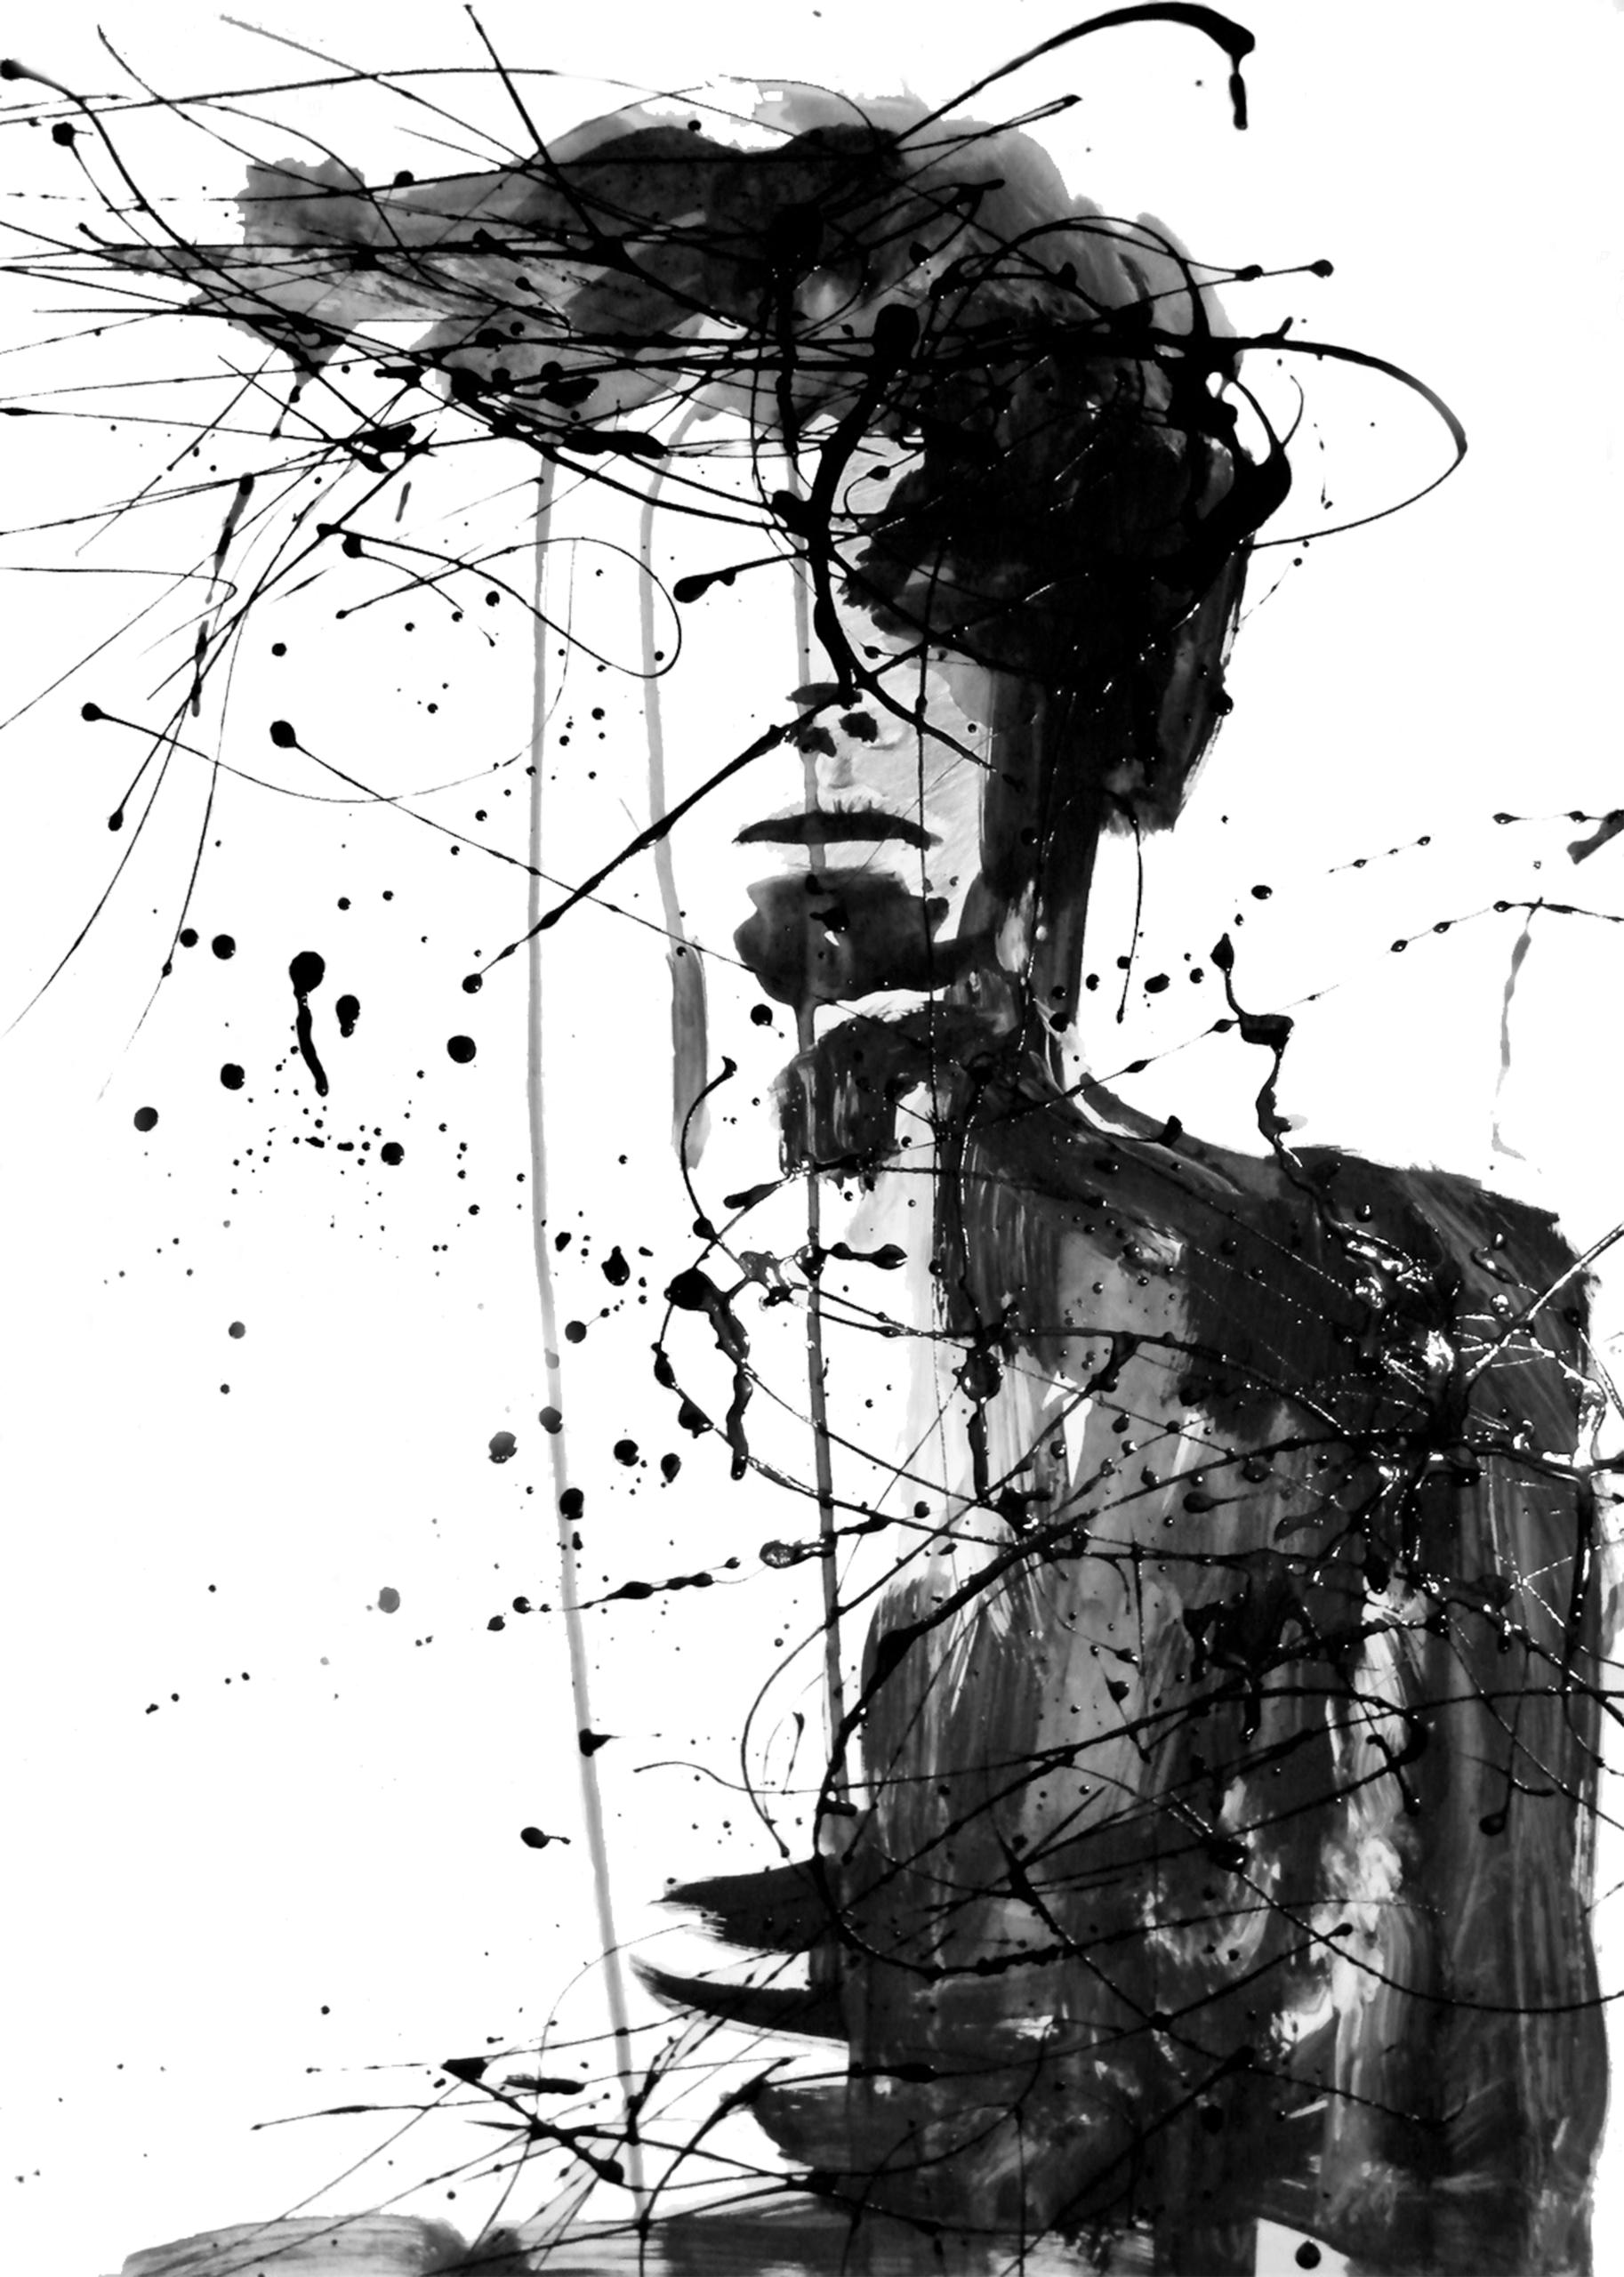 Effusion - painting - godajuskevi | ello